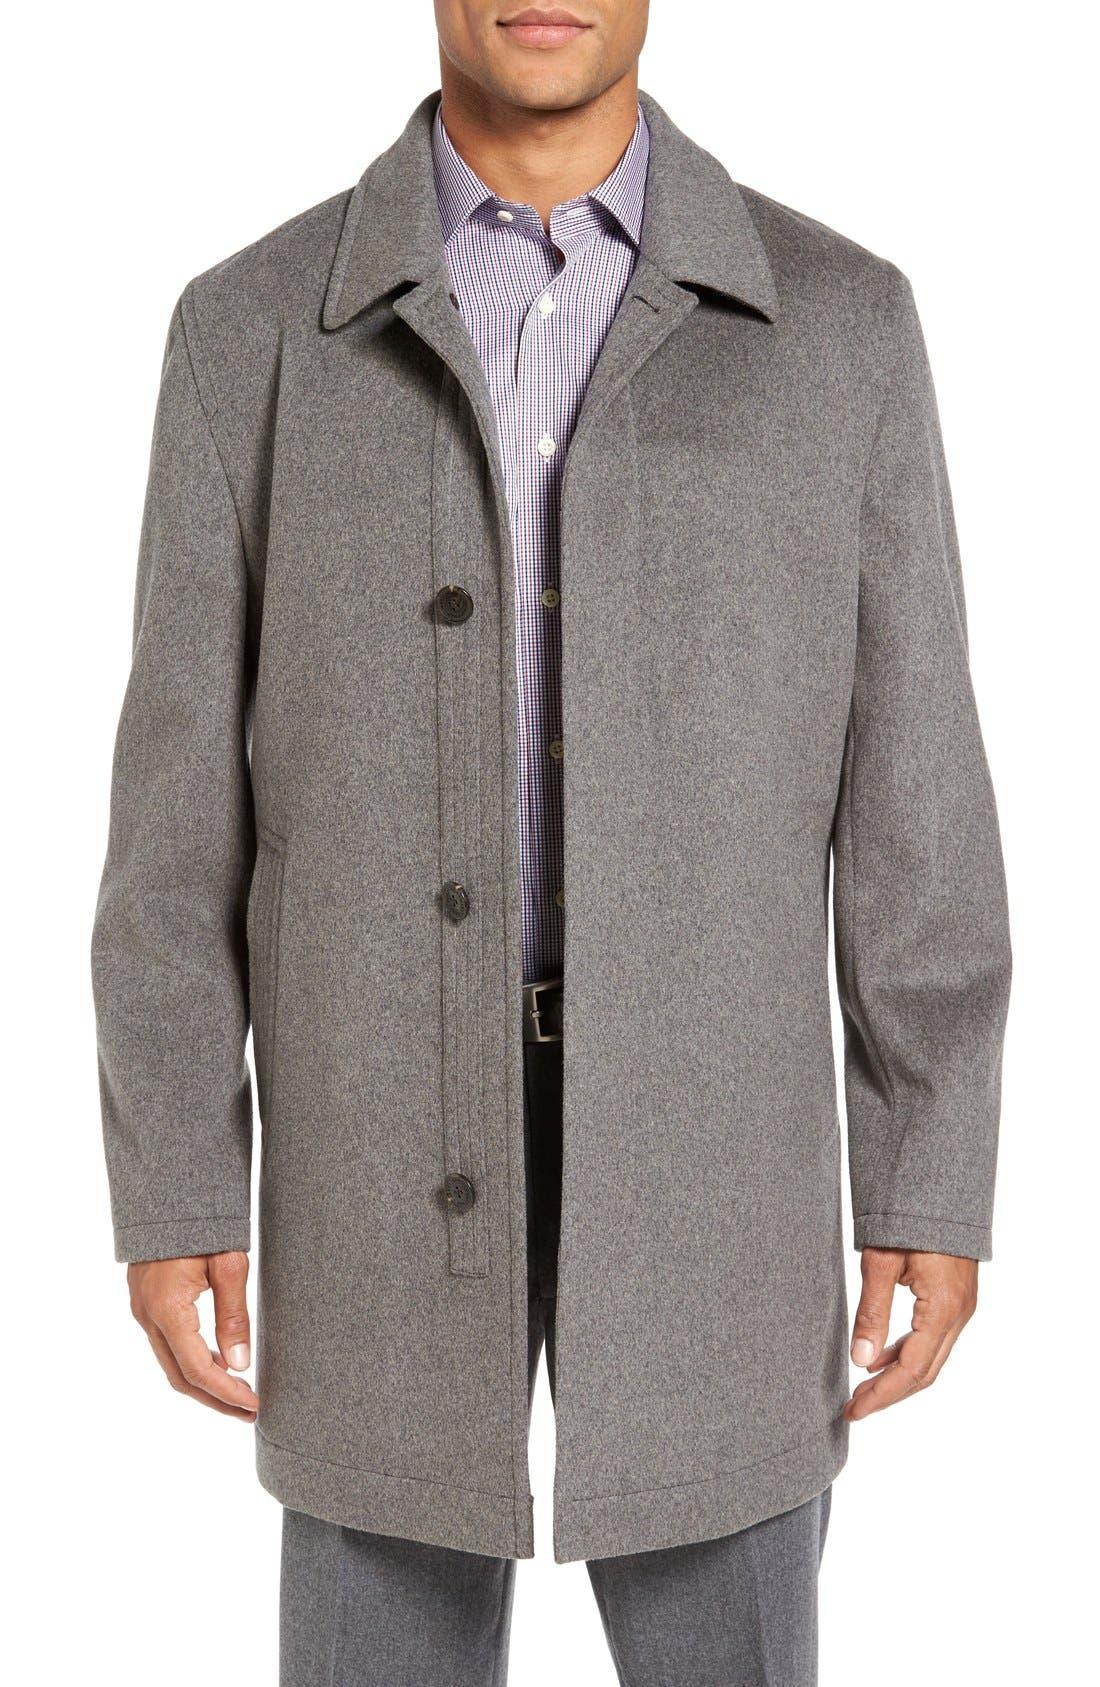 Douglas Modern Fit Wool & Cashmere Overcoat,                             Main thumbnail 2, color,